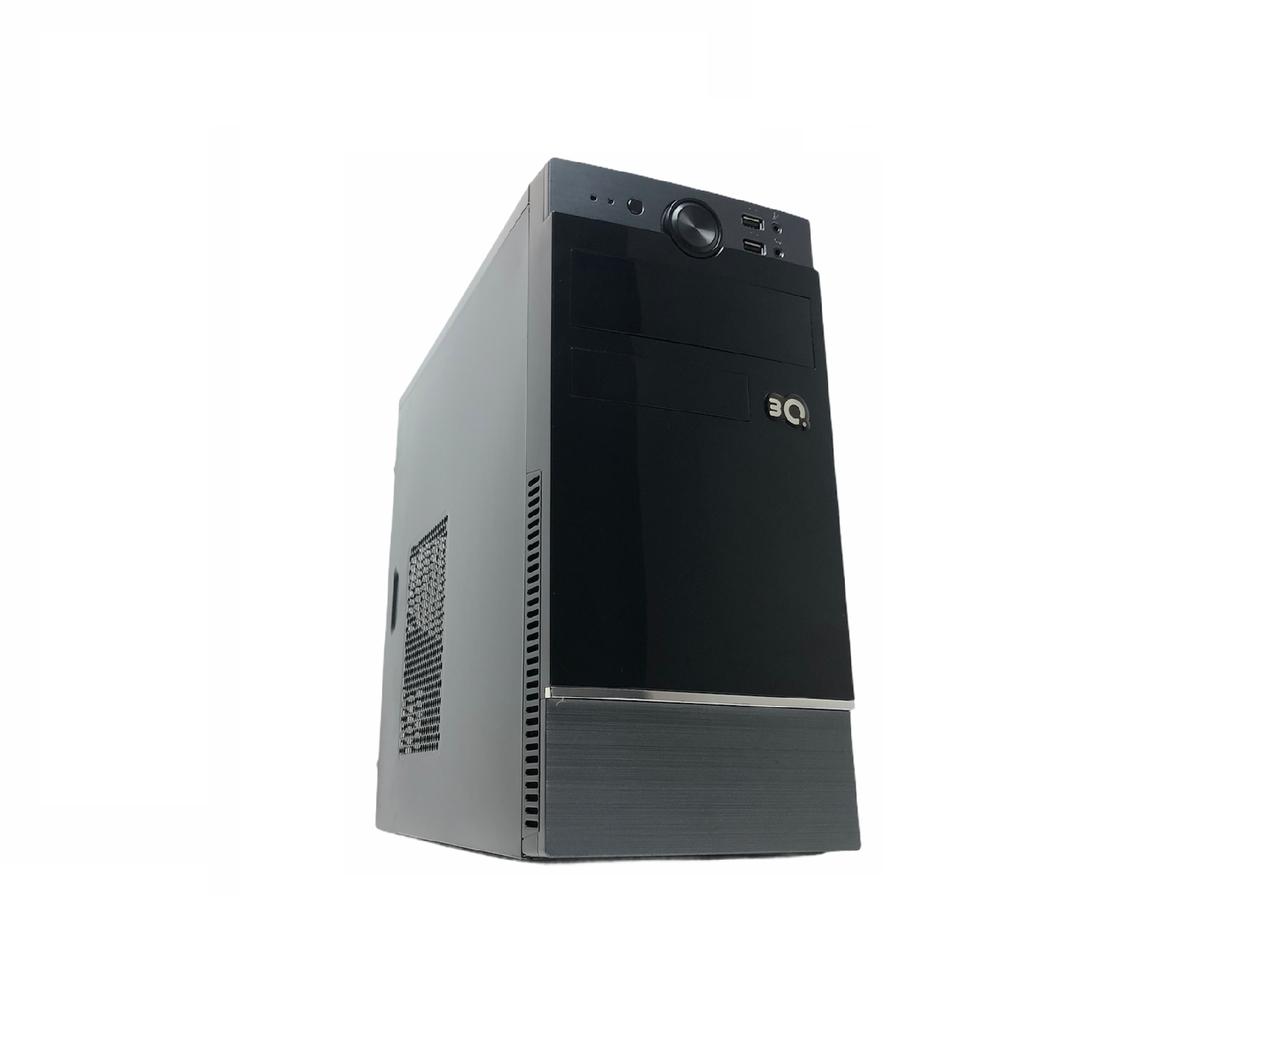 Офісний Комп'ютер Core i3-2130 4GB DDR3 HDD500GB